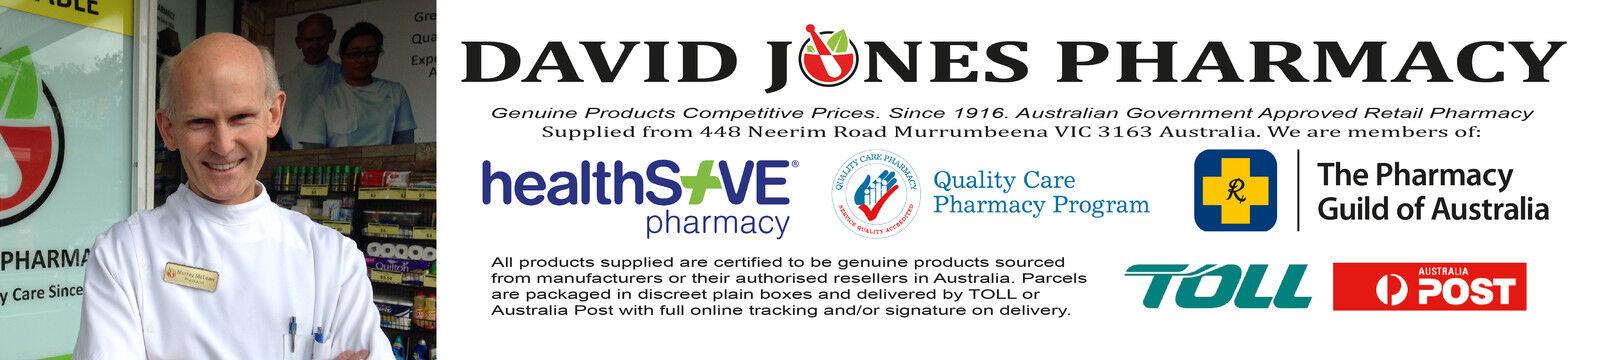 David Jones Pharmacy Australia